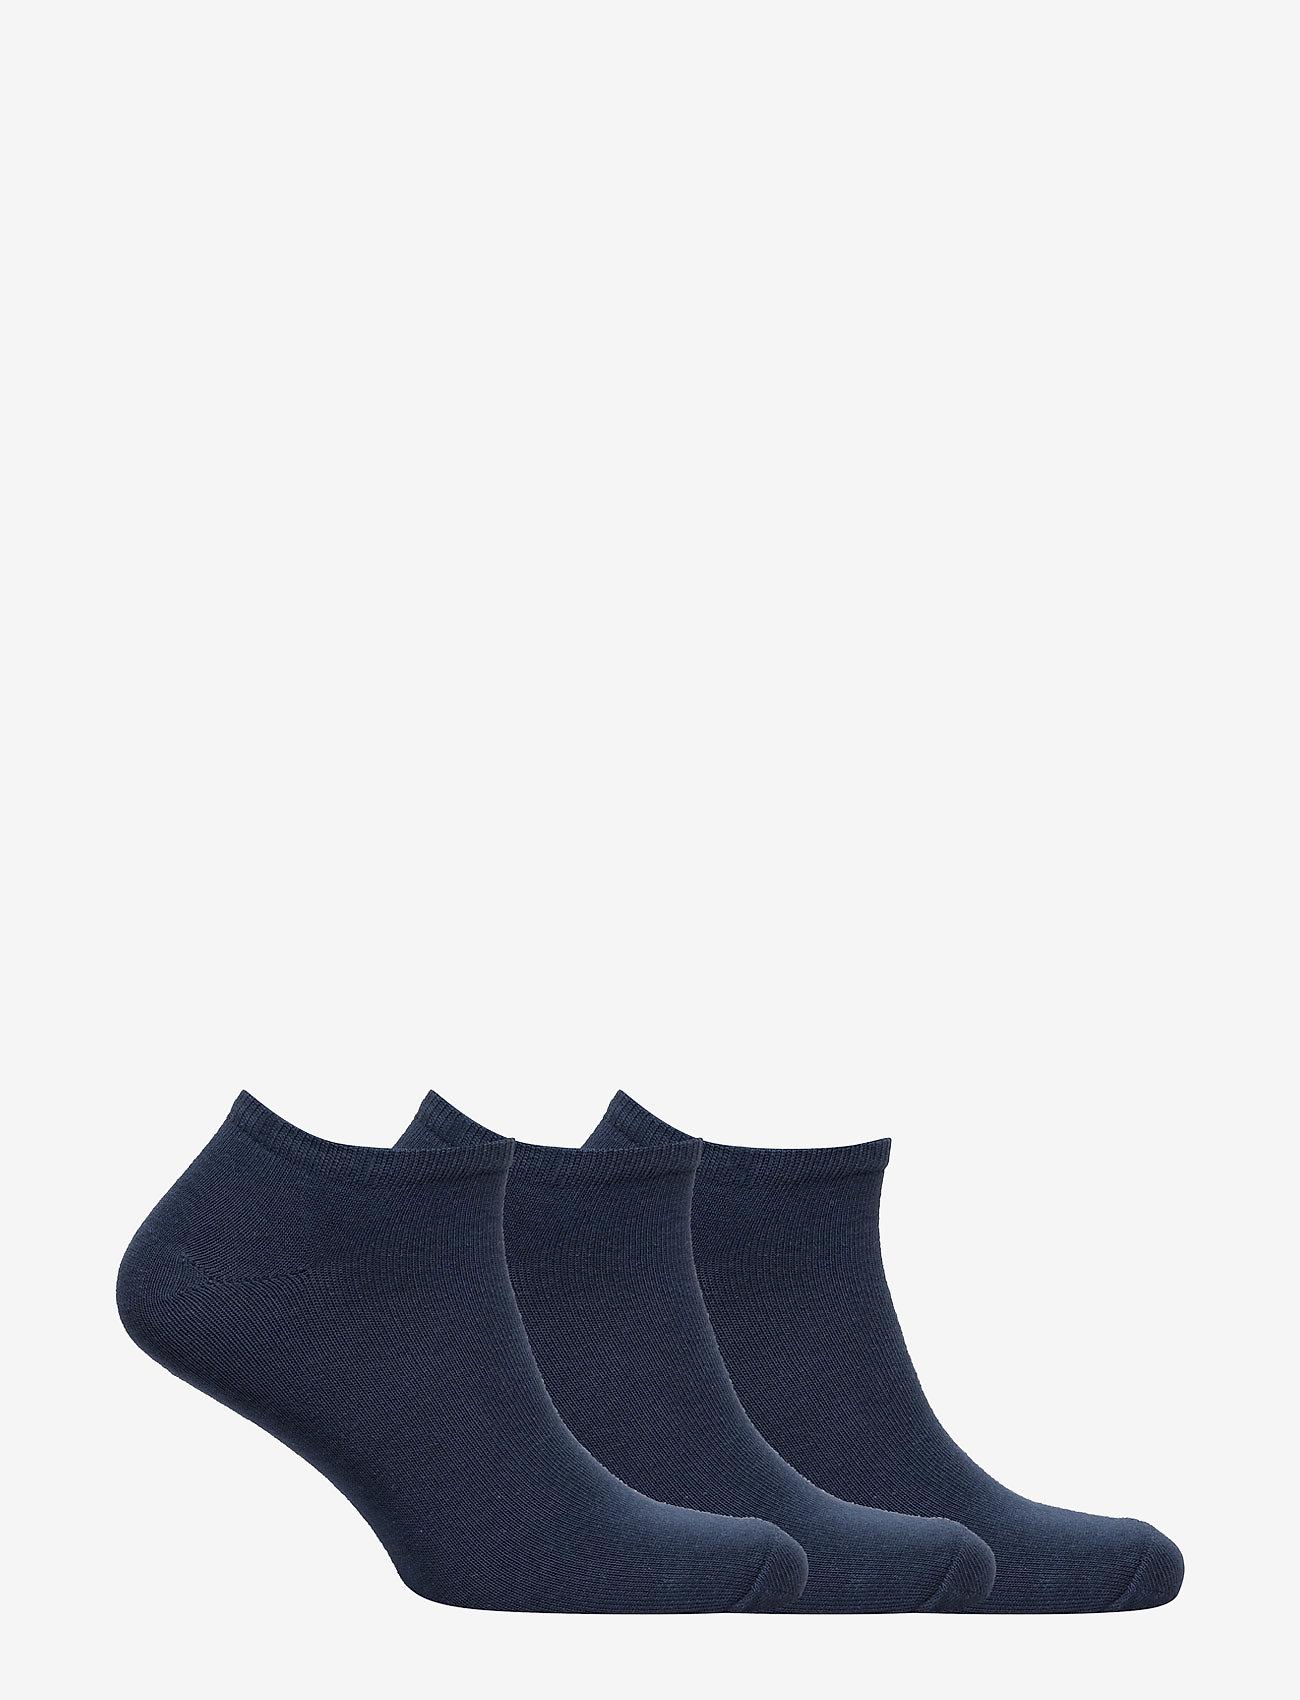 Polo Ralph Lauren Underwear - BPP SOLE-PED-3 PACK - ankle socks - navy multi - 1